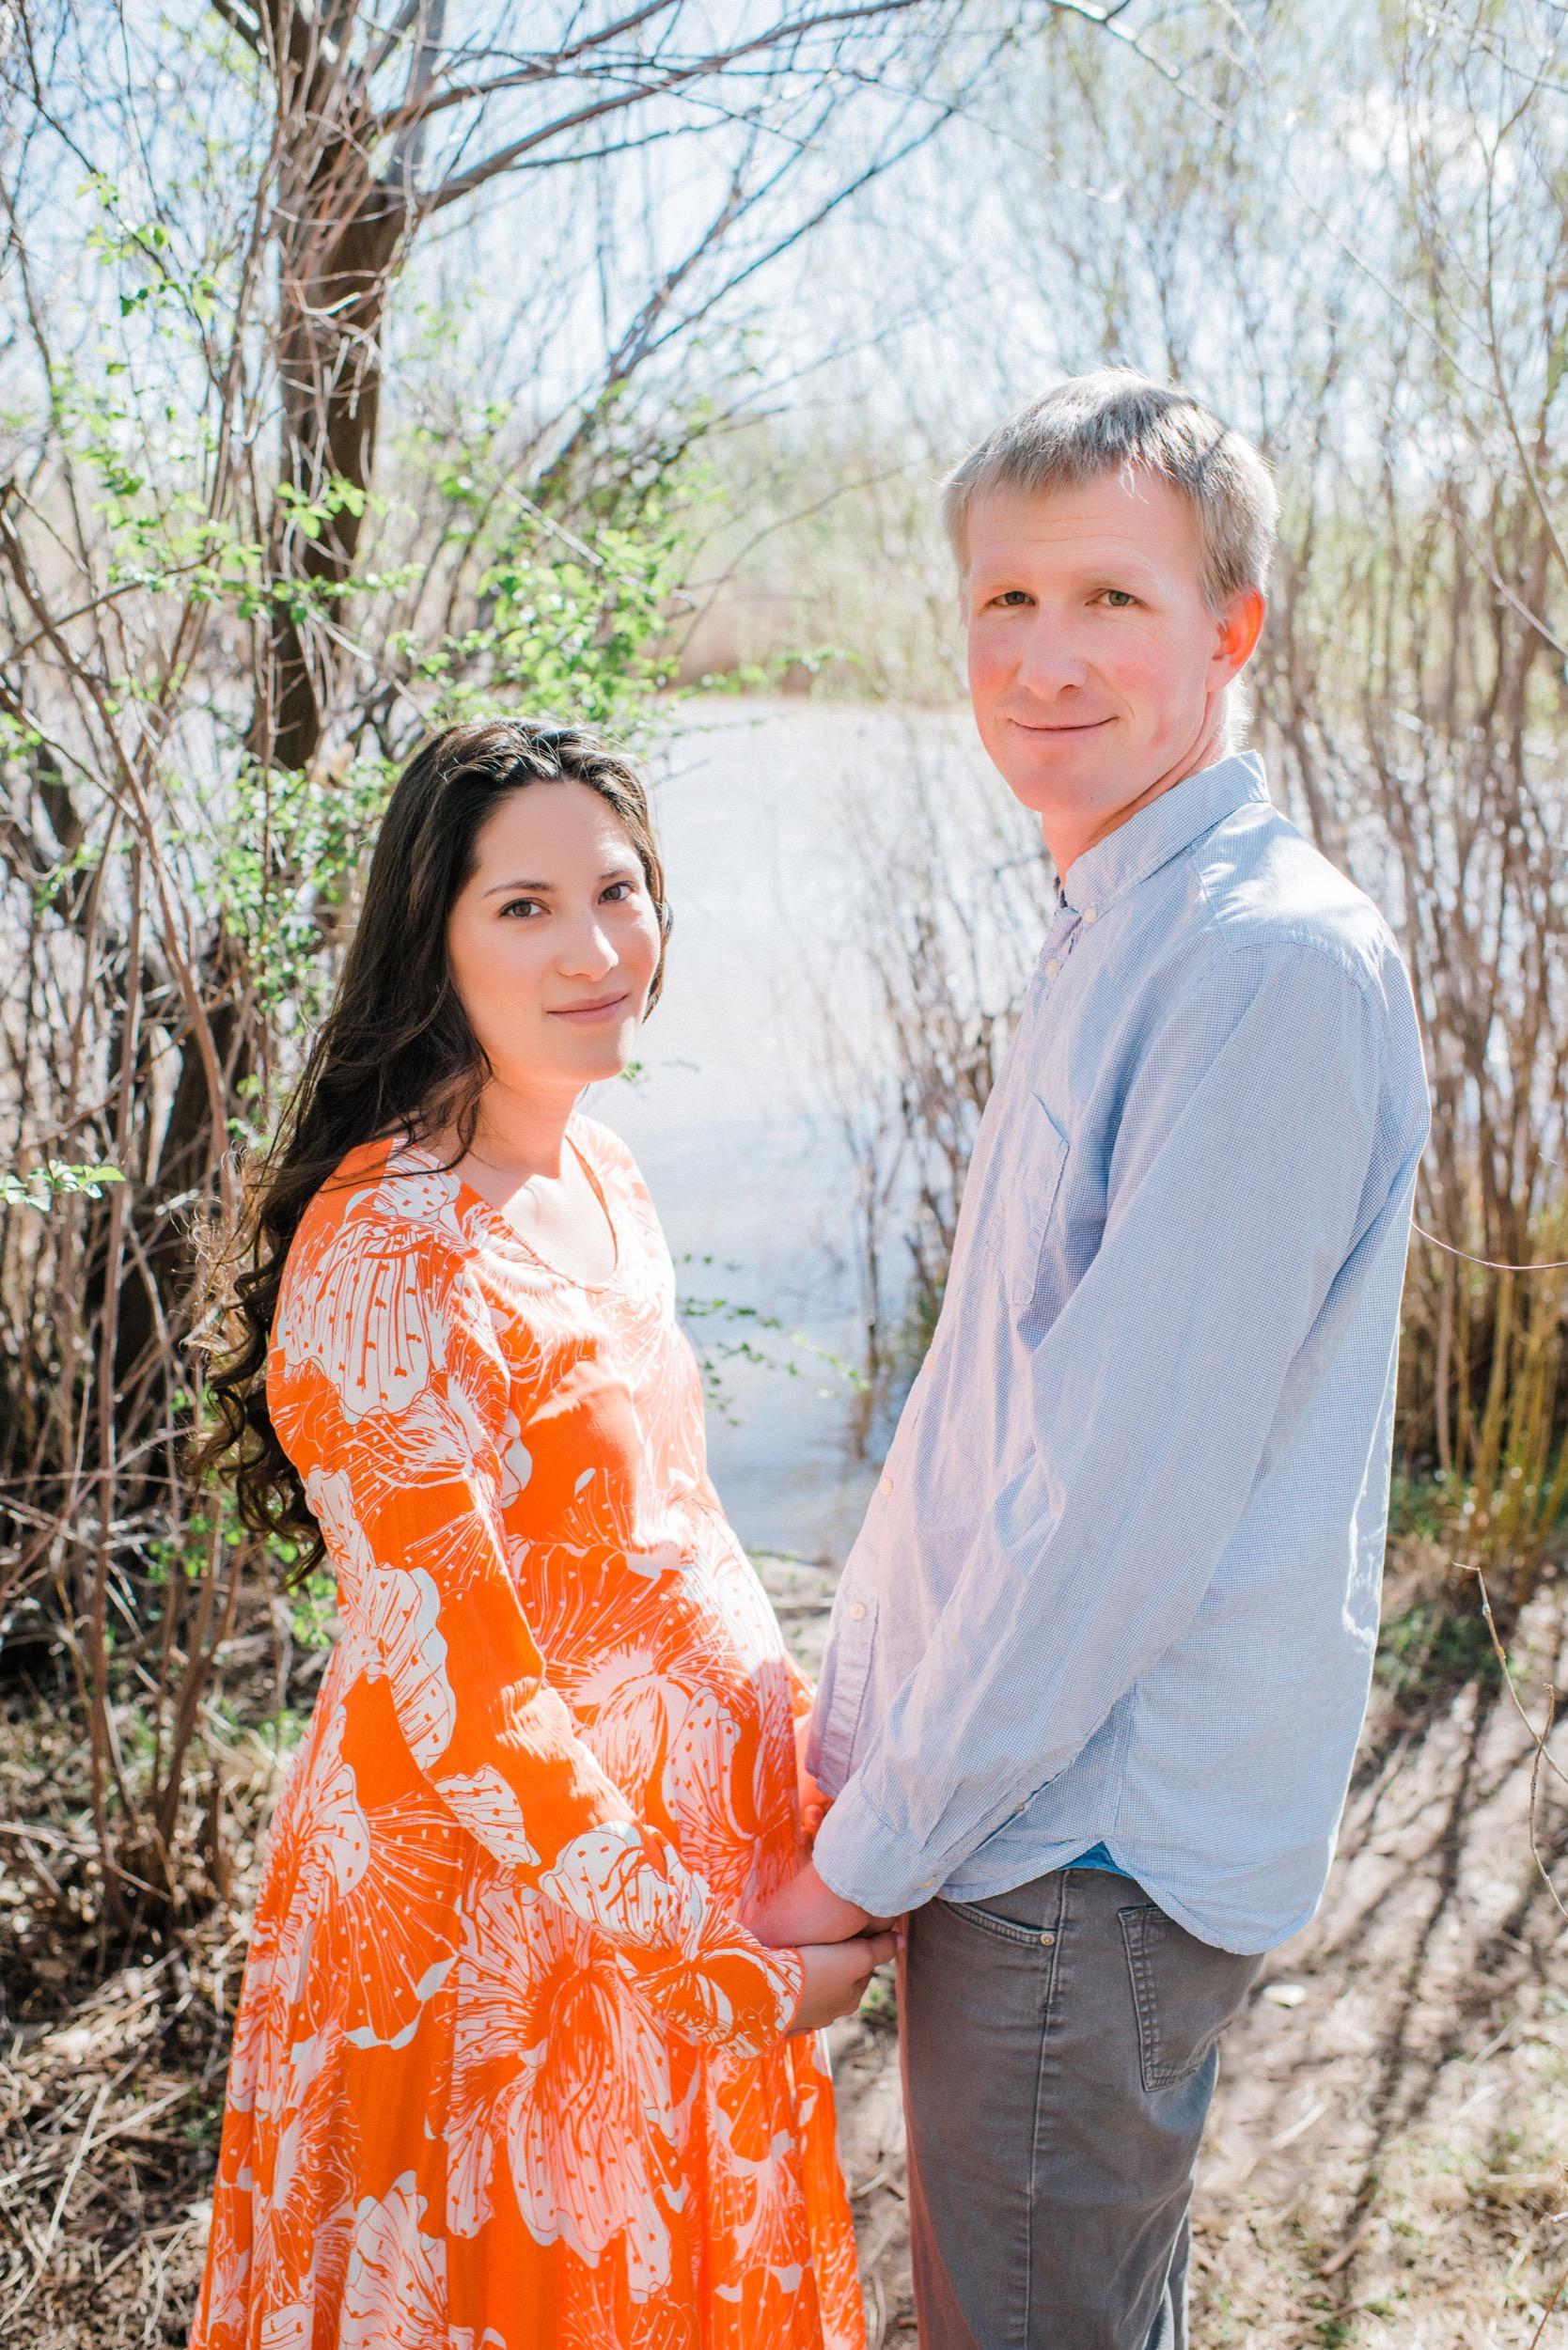 Carissa and Ben-maternity-southwest photographer-destination photographer-new mexico wedding-1029.jpg